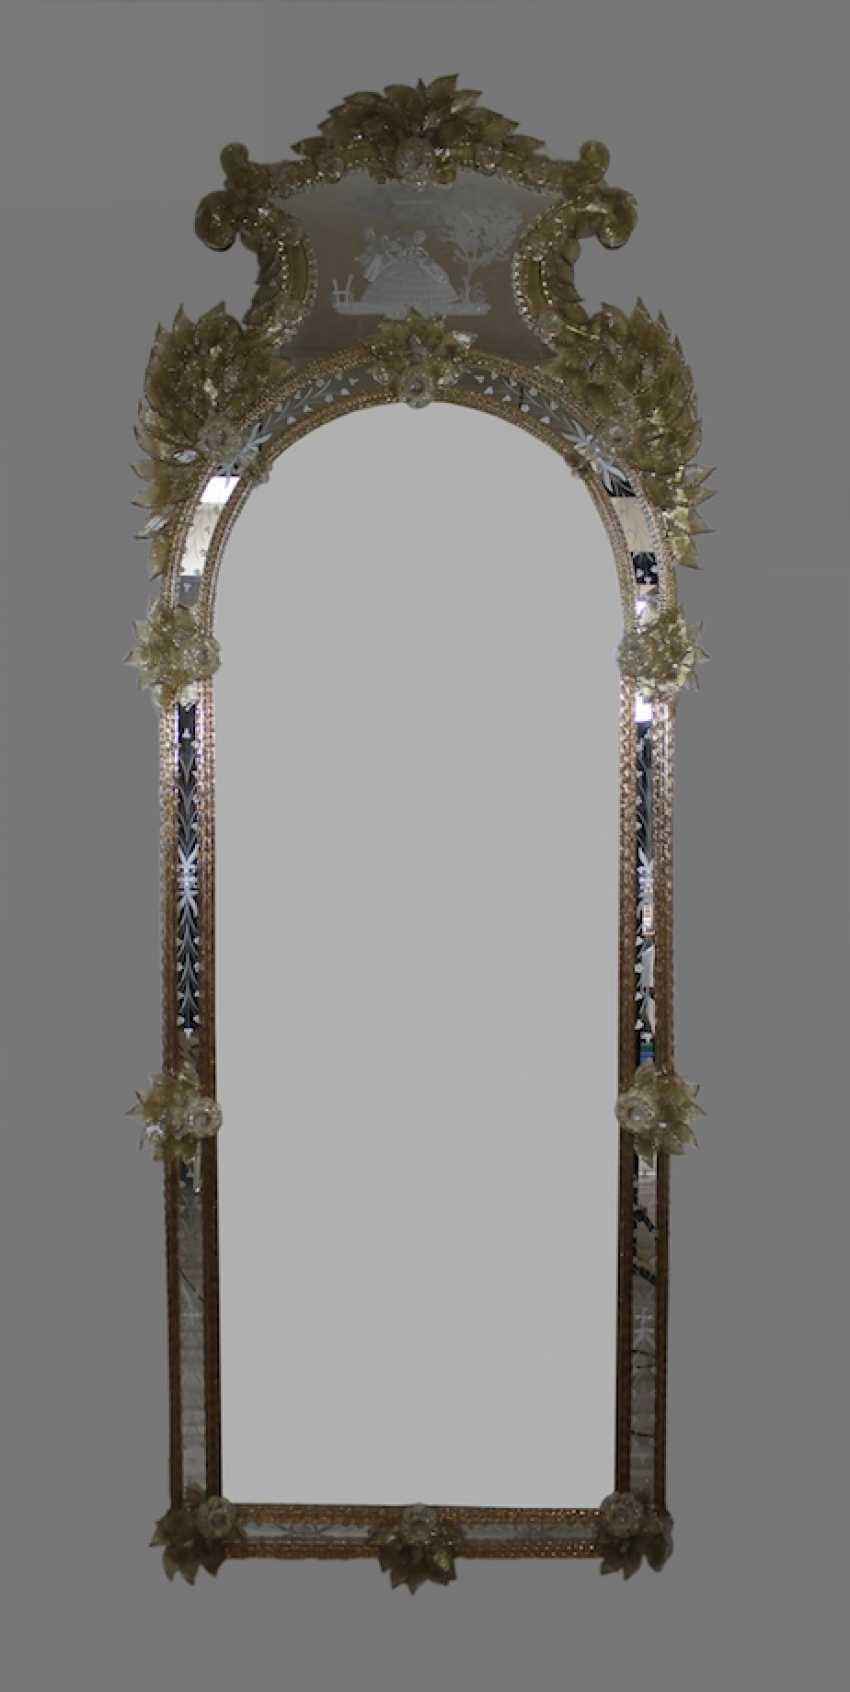 los 1010 gro er murano spiegel aus dem katalog fr hjahrsauktion kunst und antiquit ten vom 09. Black Bedroom Furniture Sets. Home Design Ideas